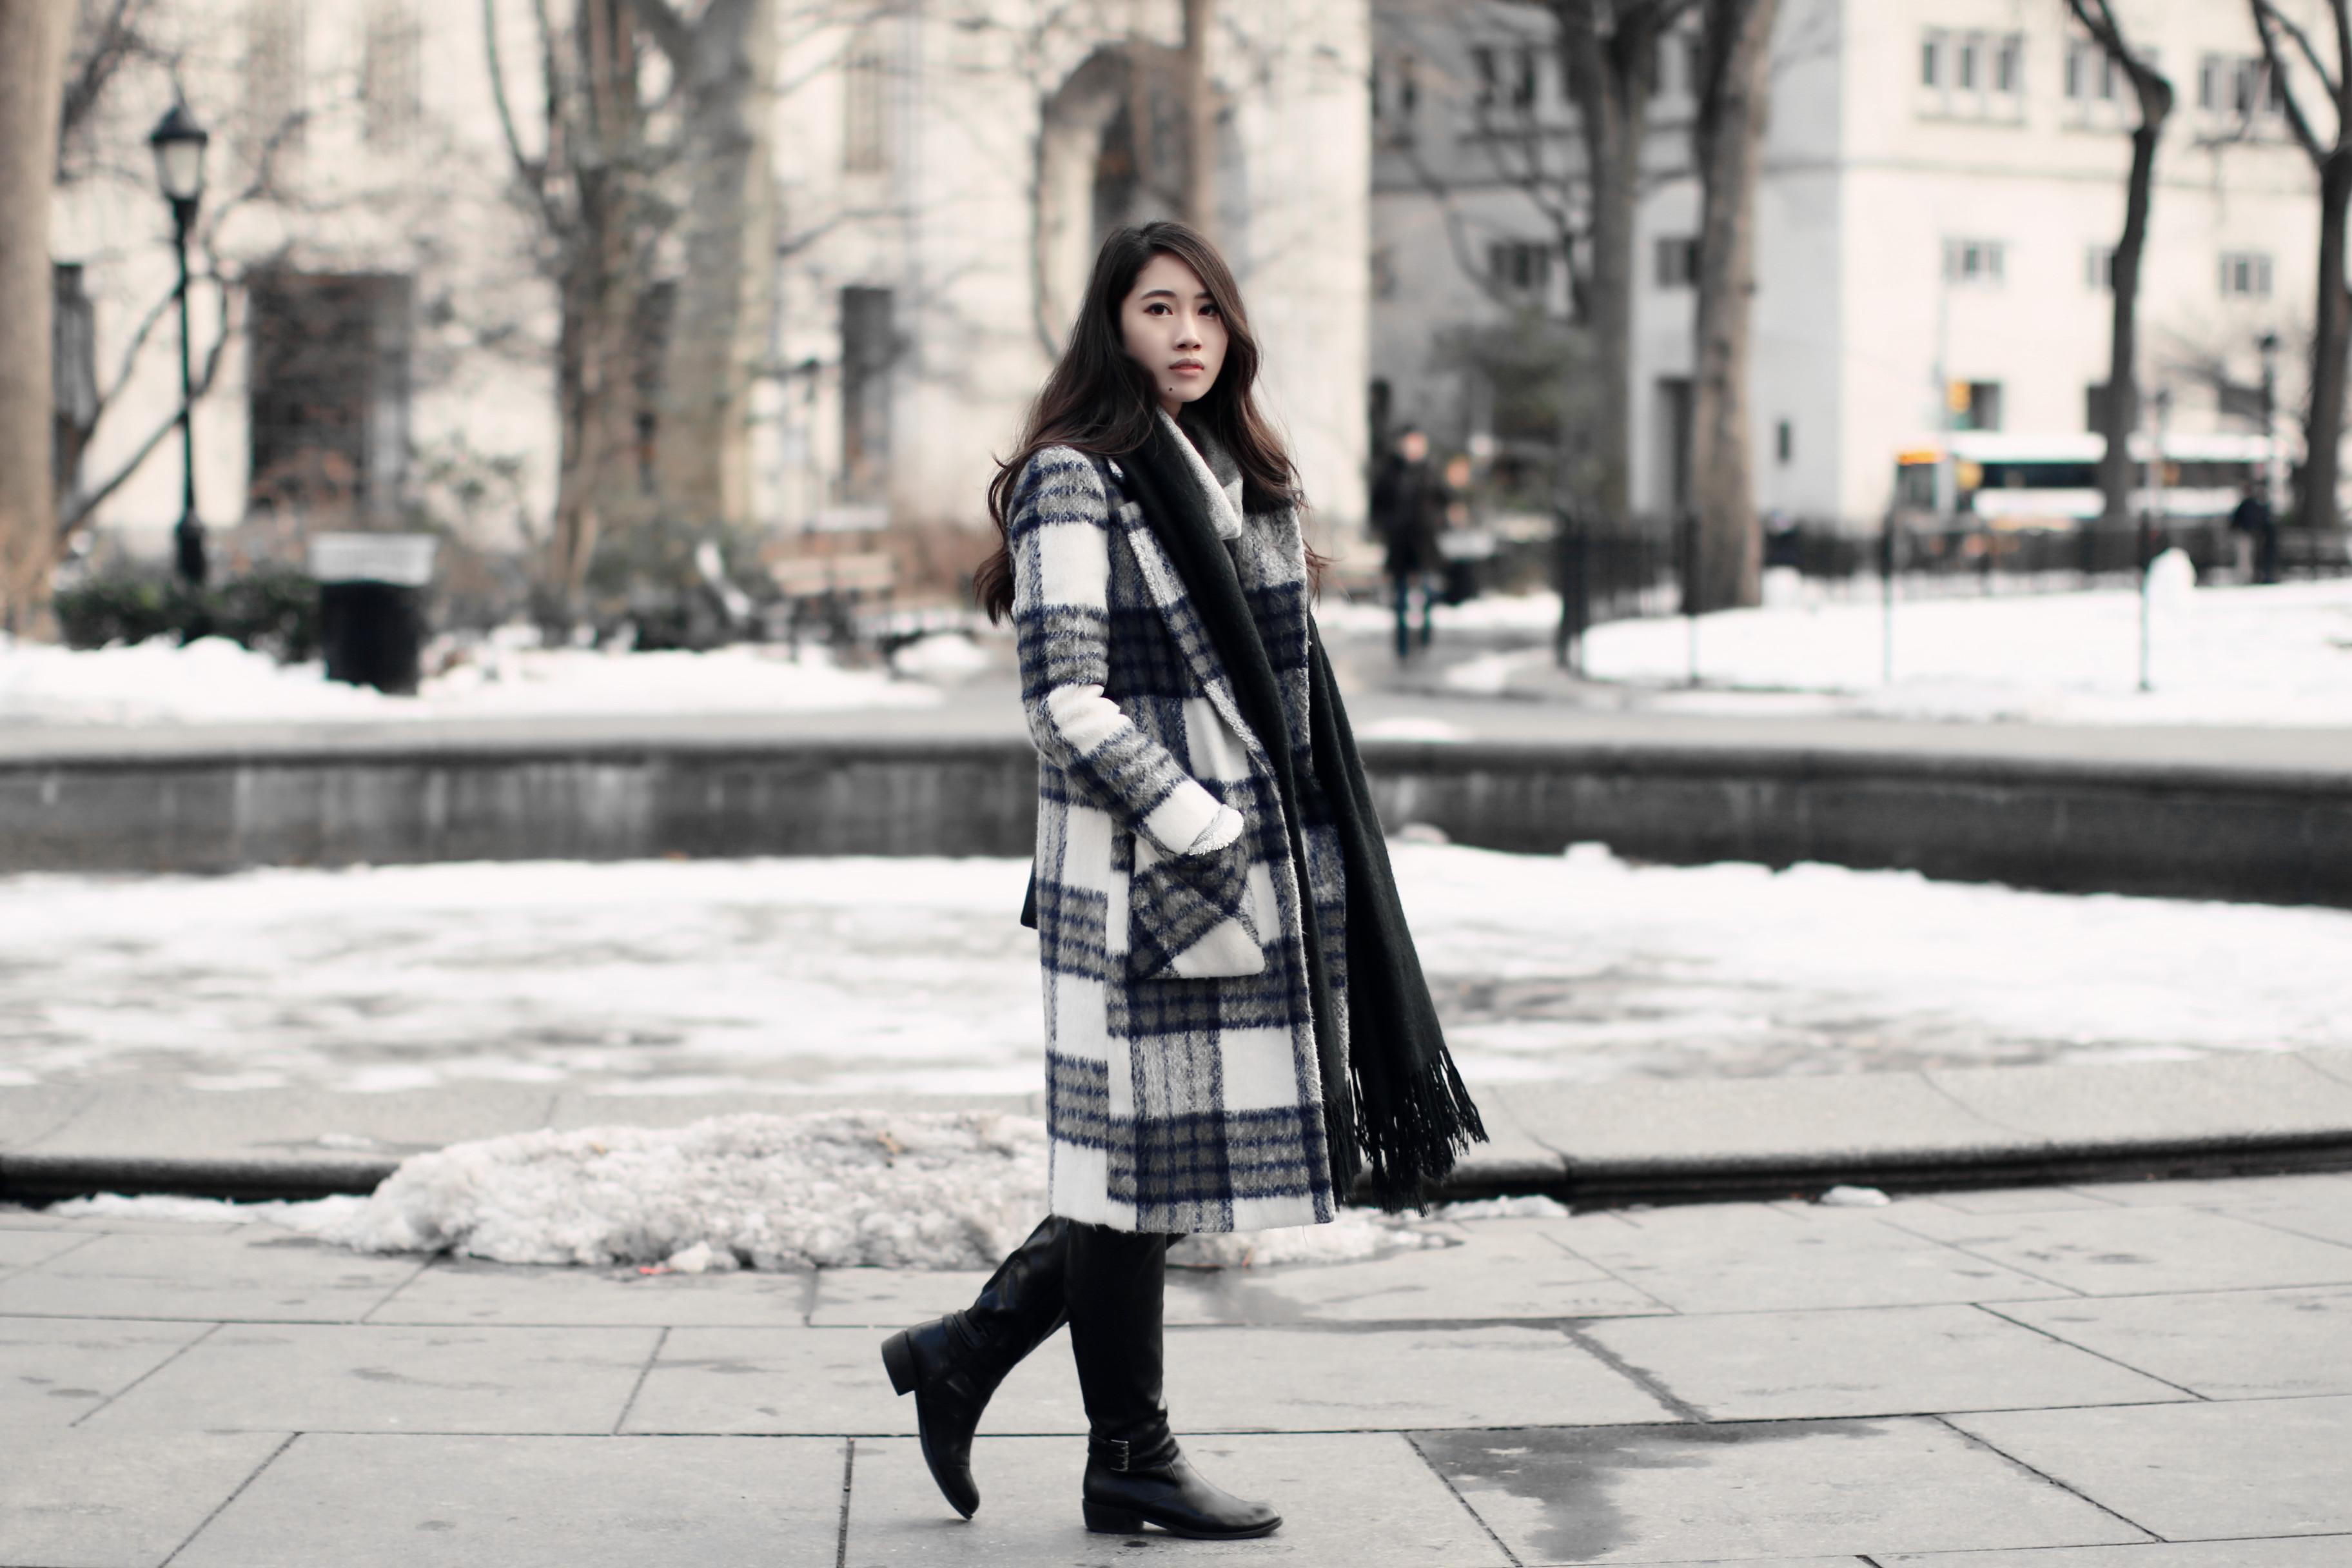 2096-clothestoyouuu-elizabeeetht-nyfw-newyorkfashionweek-nyc-fashionweek-newyork- winter2017-fashion-ootd